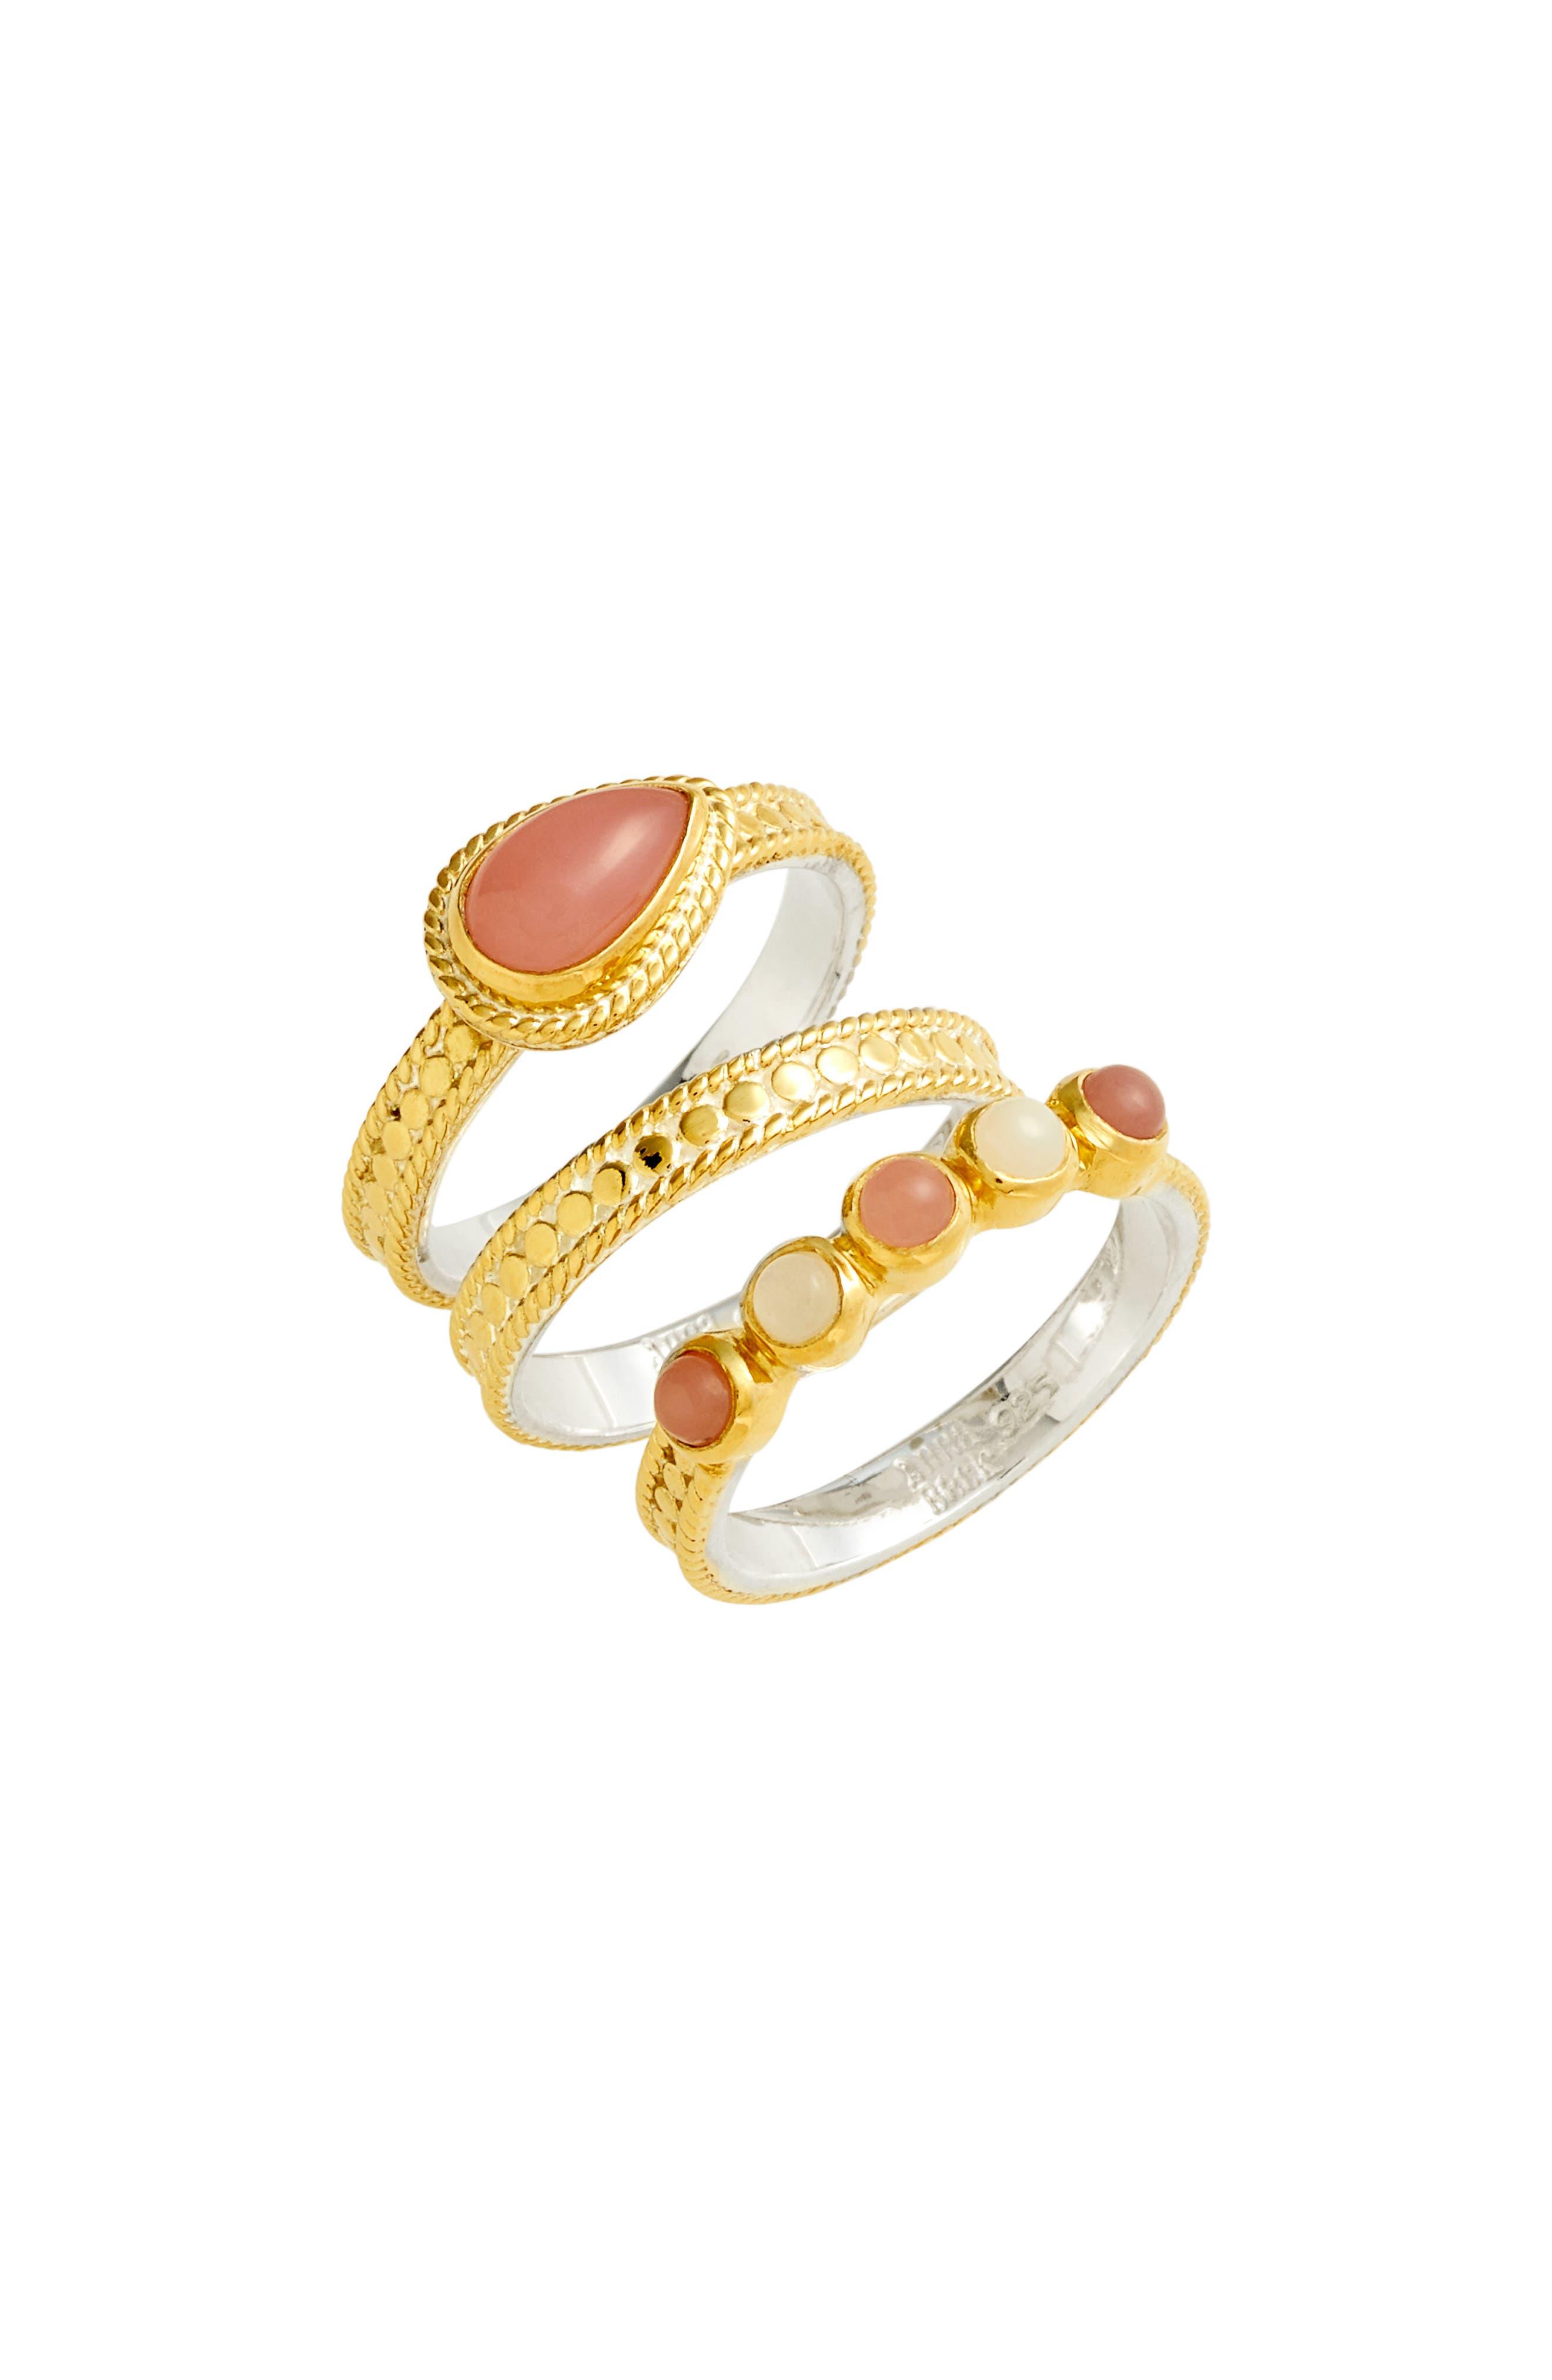 Guava Quartz & Moonstone Set of 3 Stacking Rings,                             Main thumbnail 1, color,                             Gold/ Guava/ Moonstone